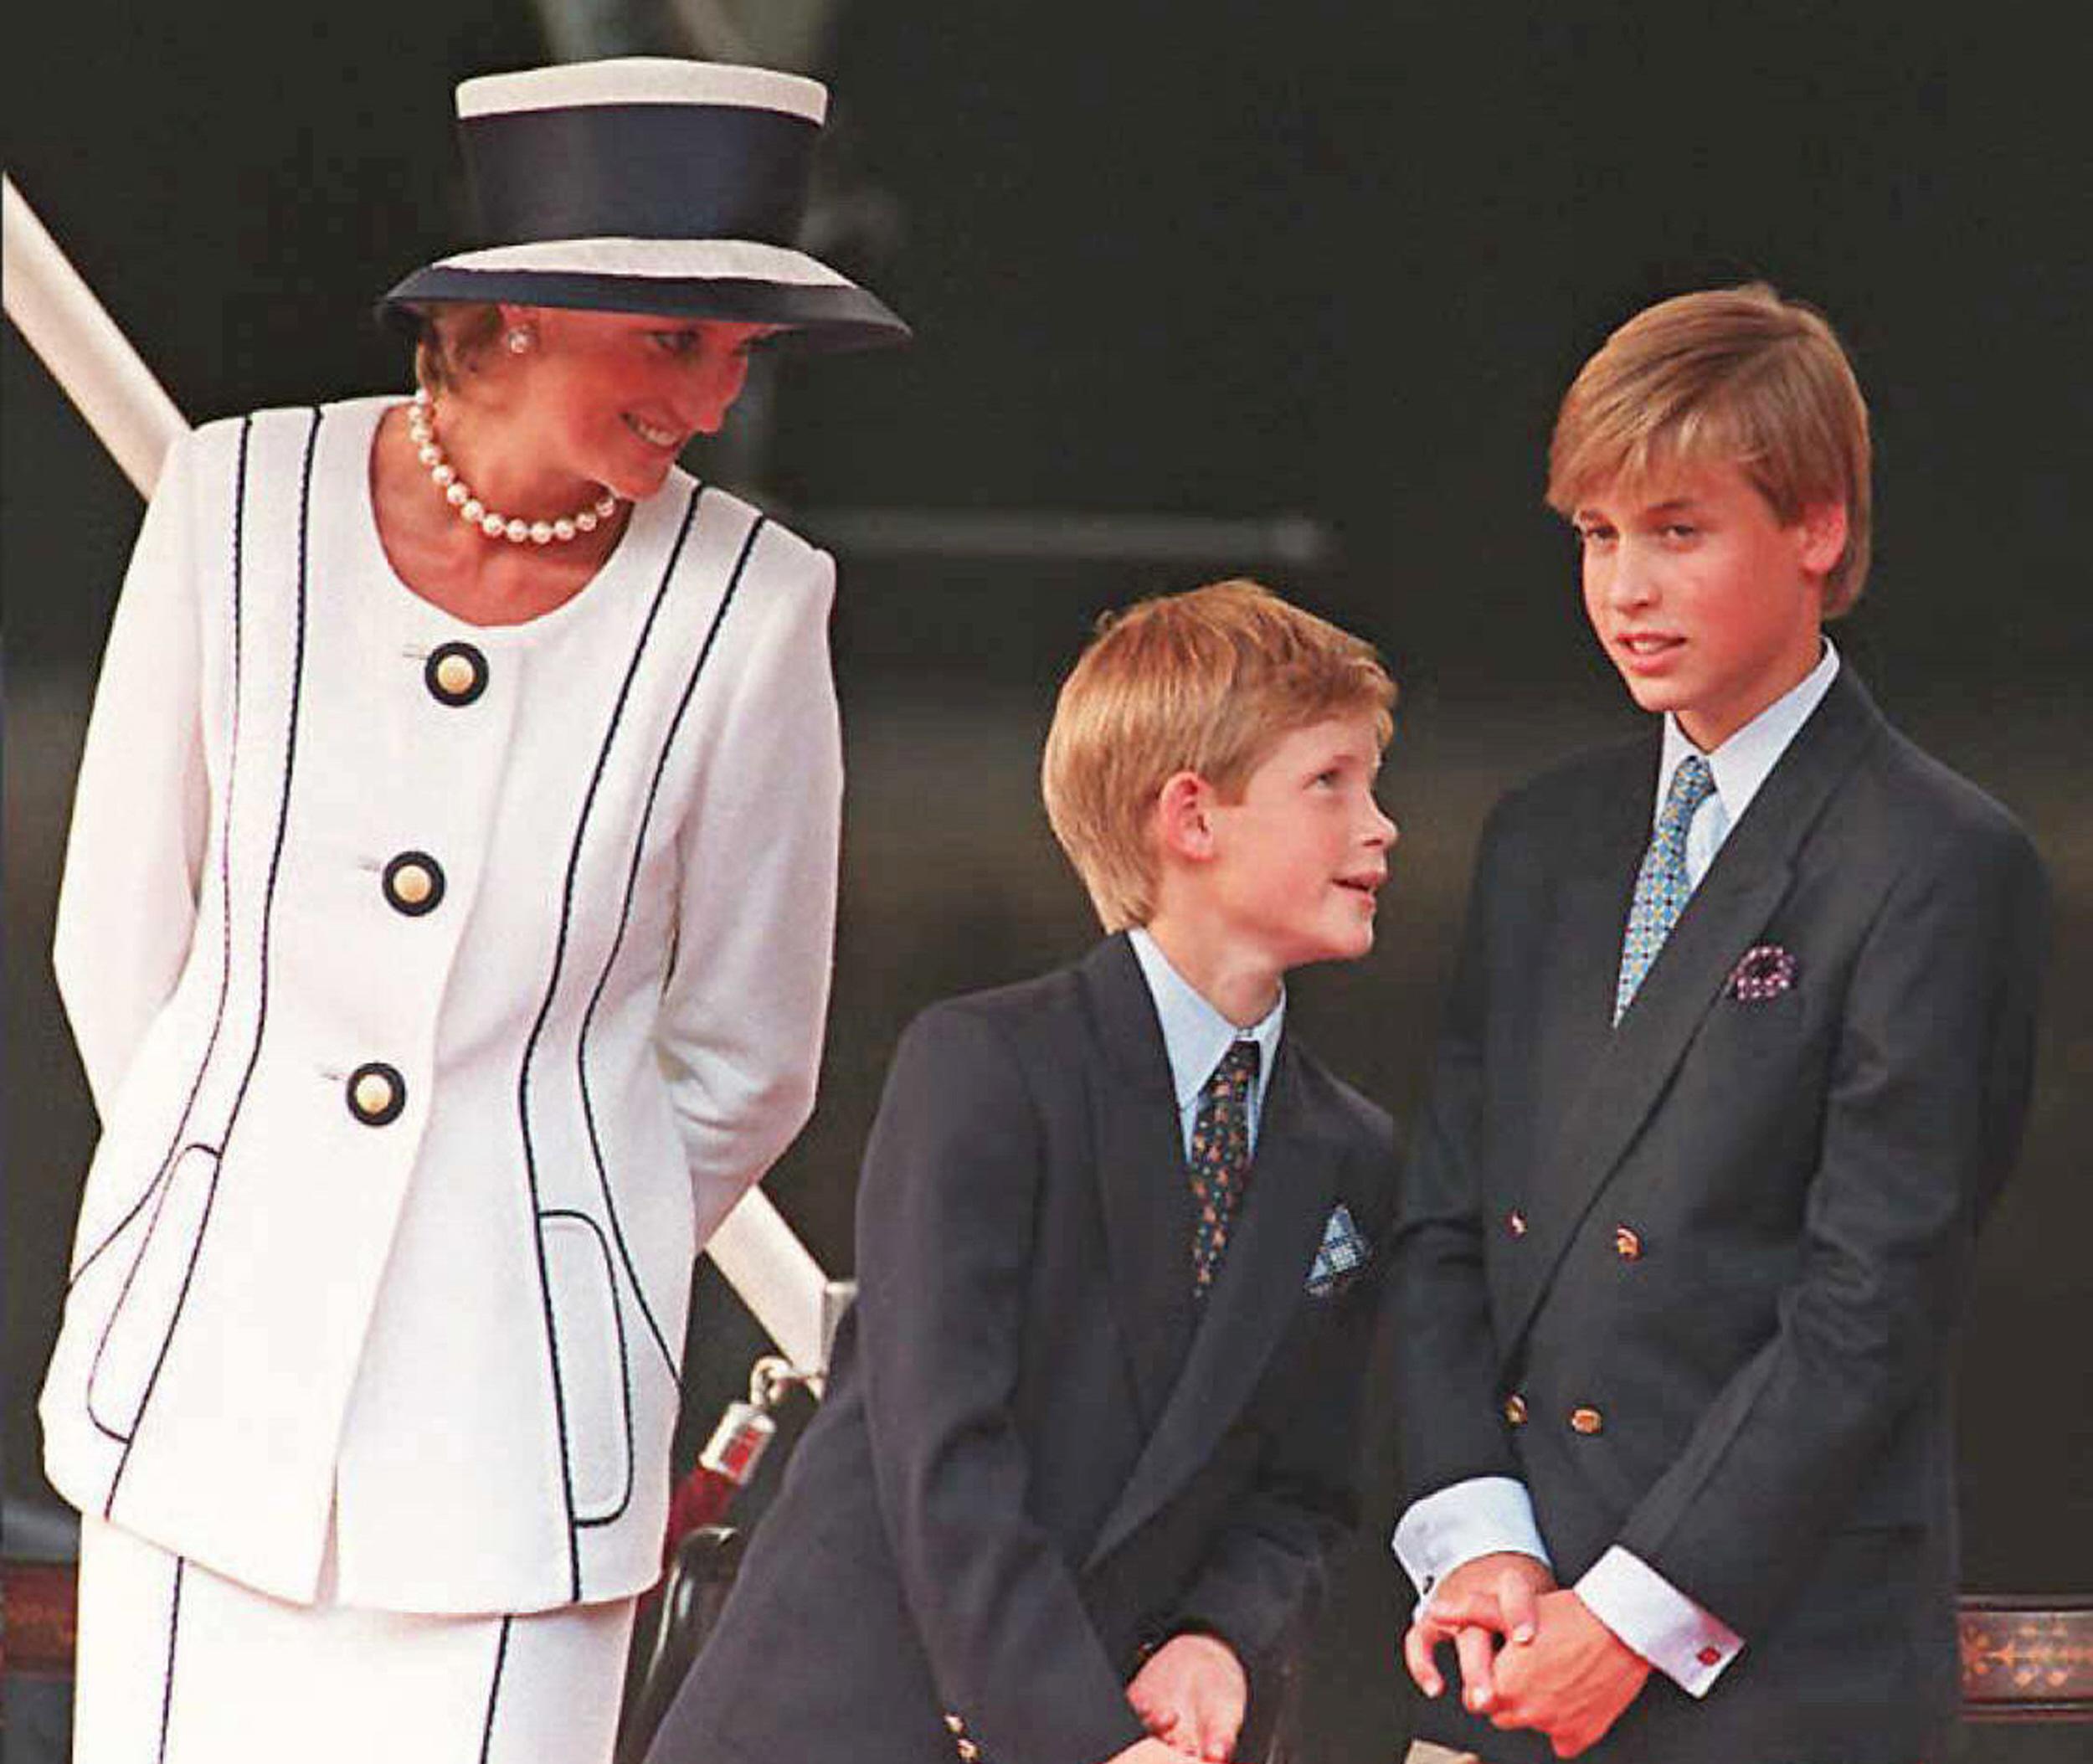 Harry vuole proteggere Meghan Markle come avrebbe protetto Lady Diana.